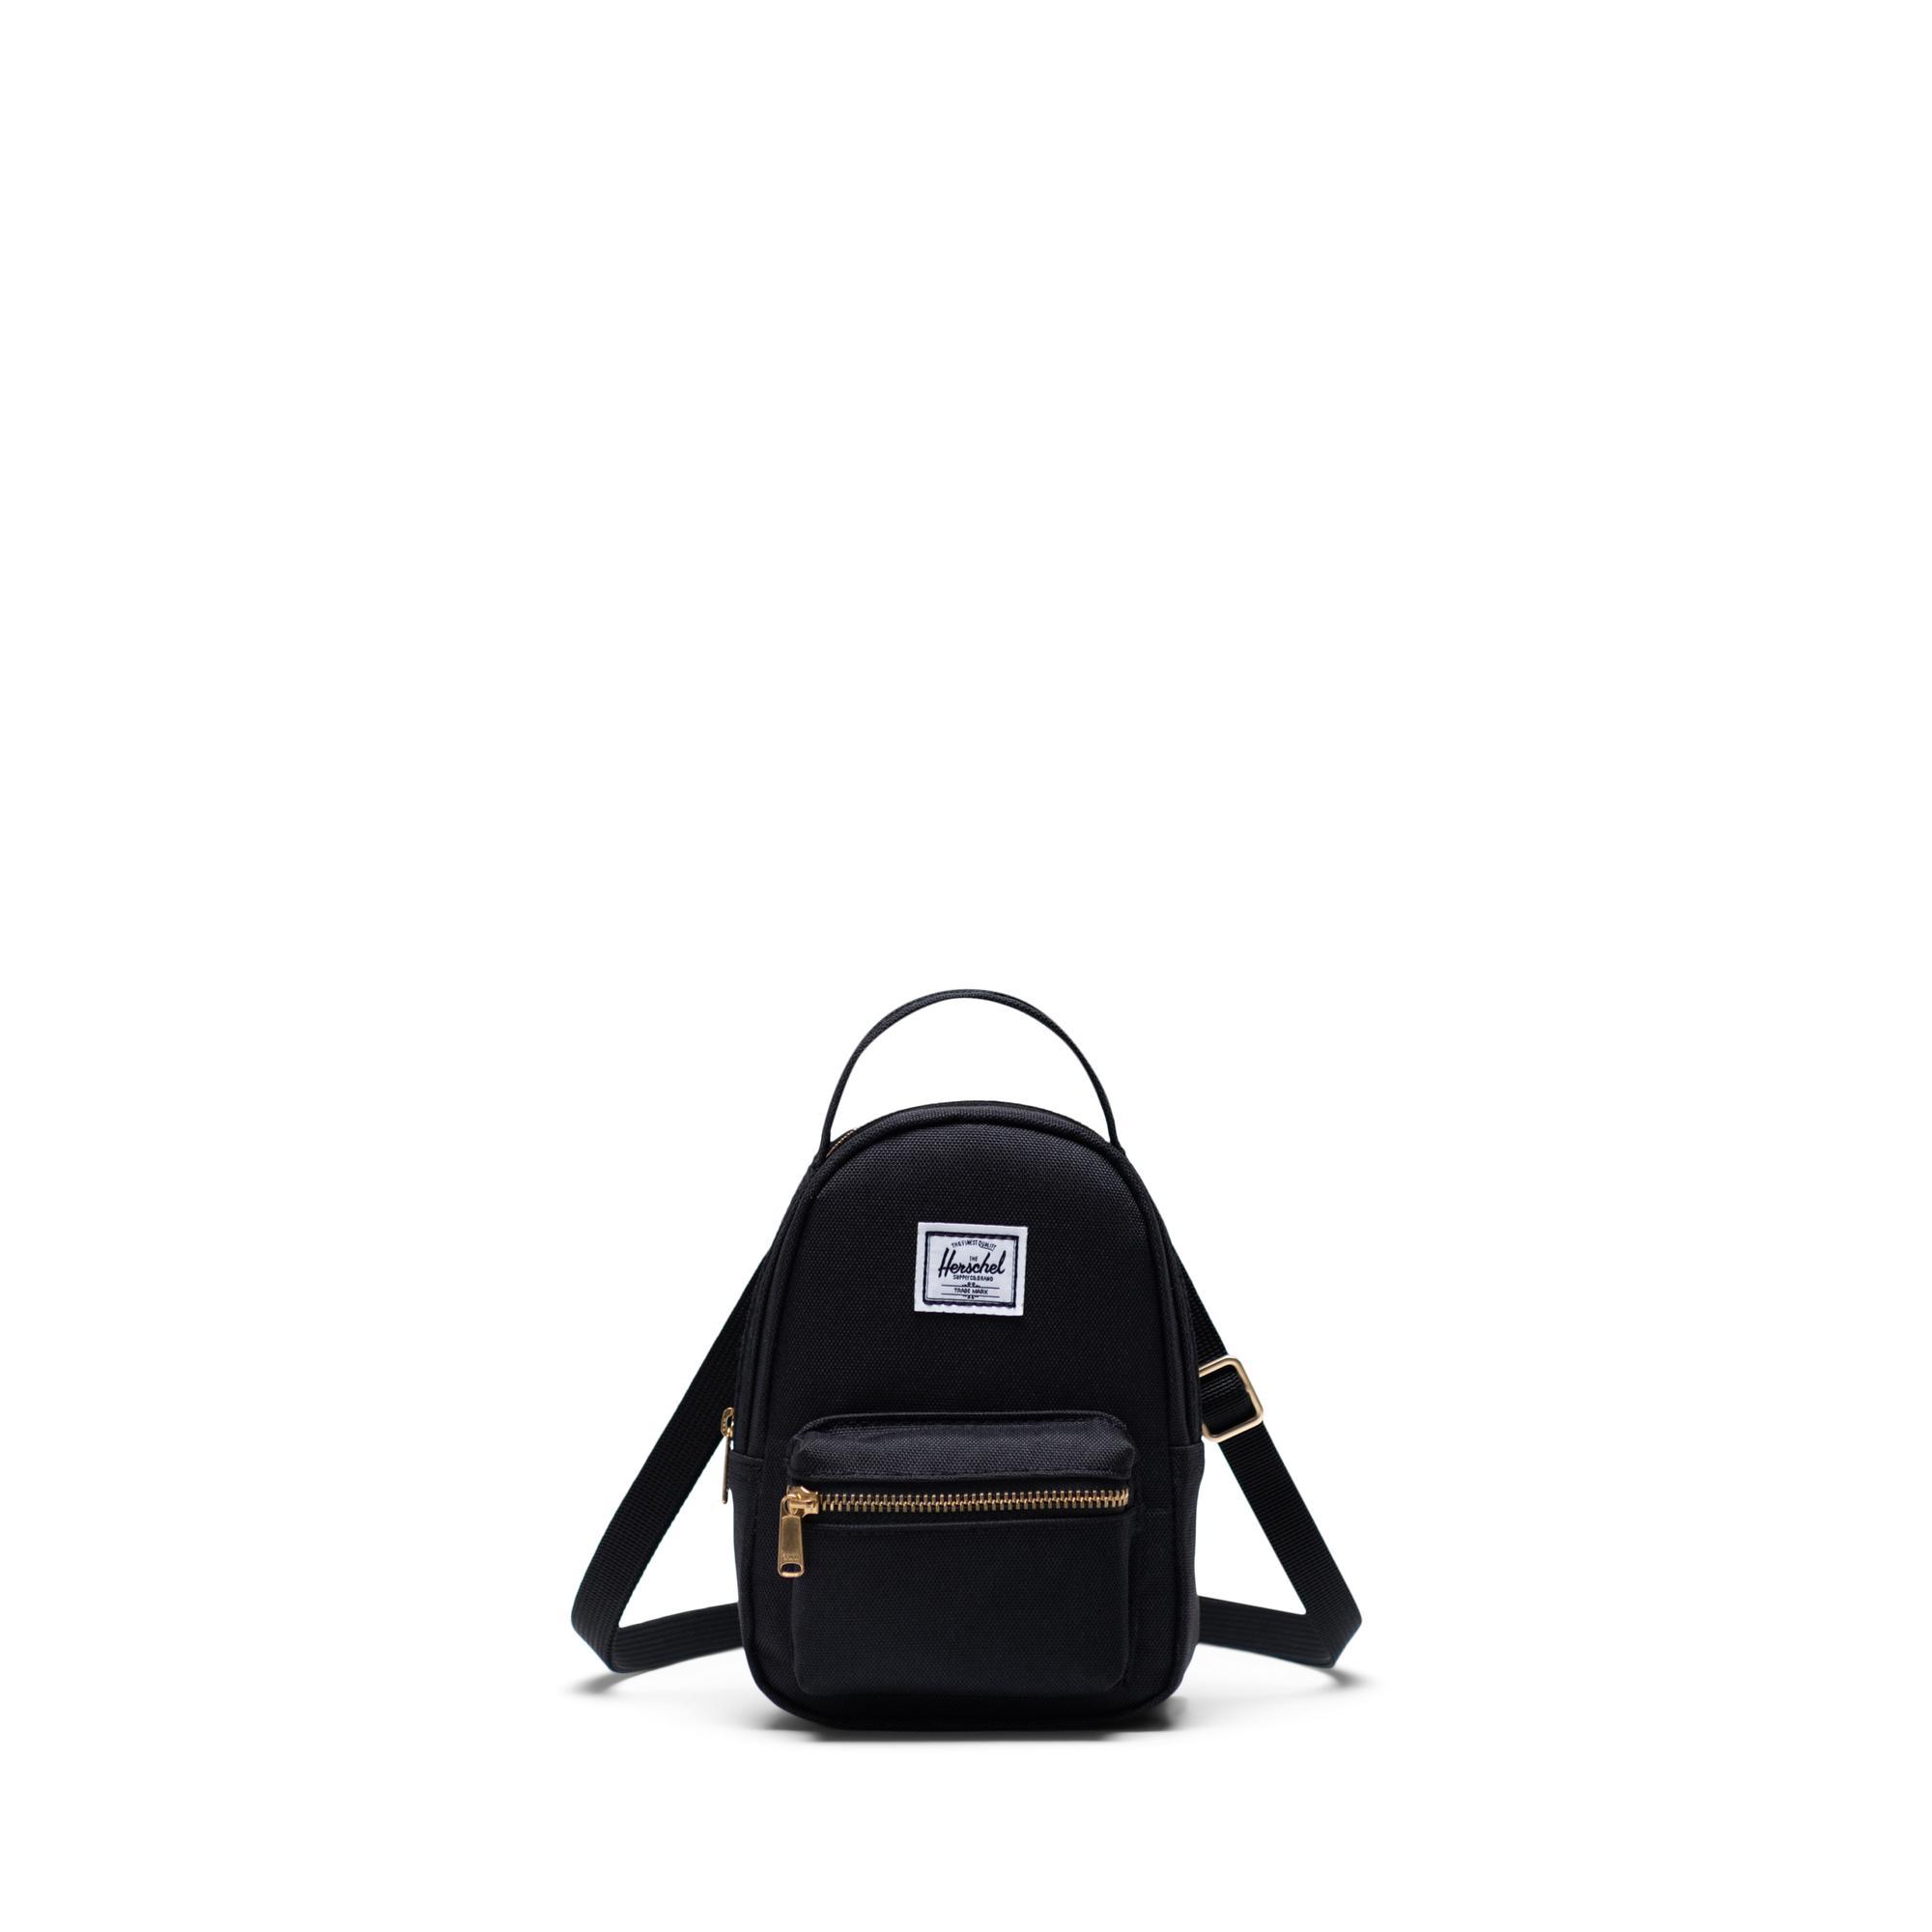 Small shoulder bag Black shoulder bag Men leather accessories Tiny zipper bag Tiny messenger bag Crossbody bag UTAH small black leather bag